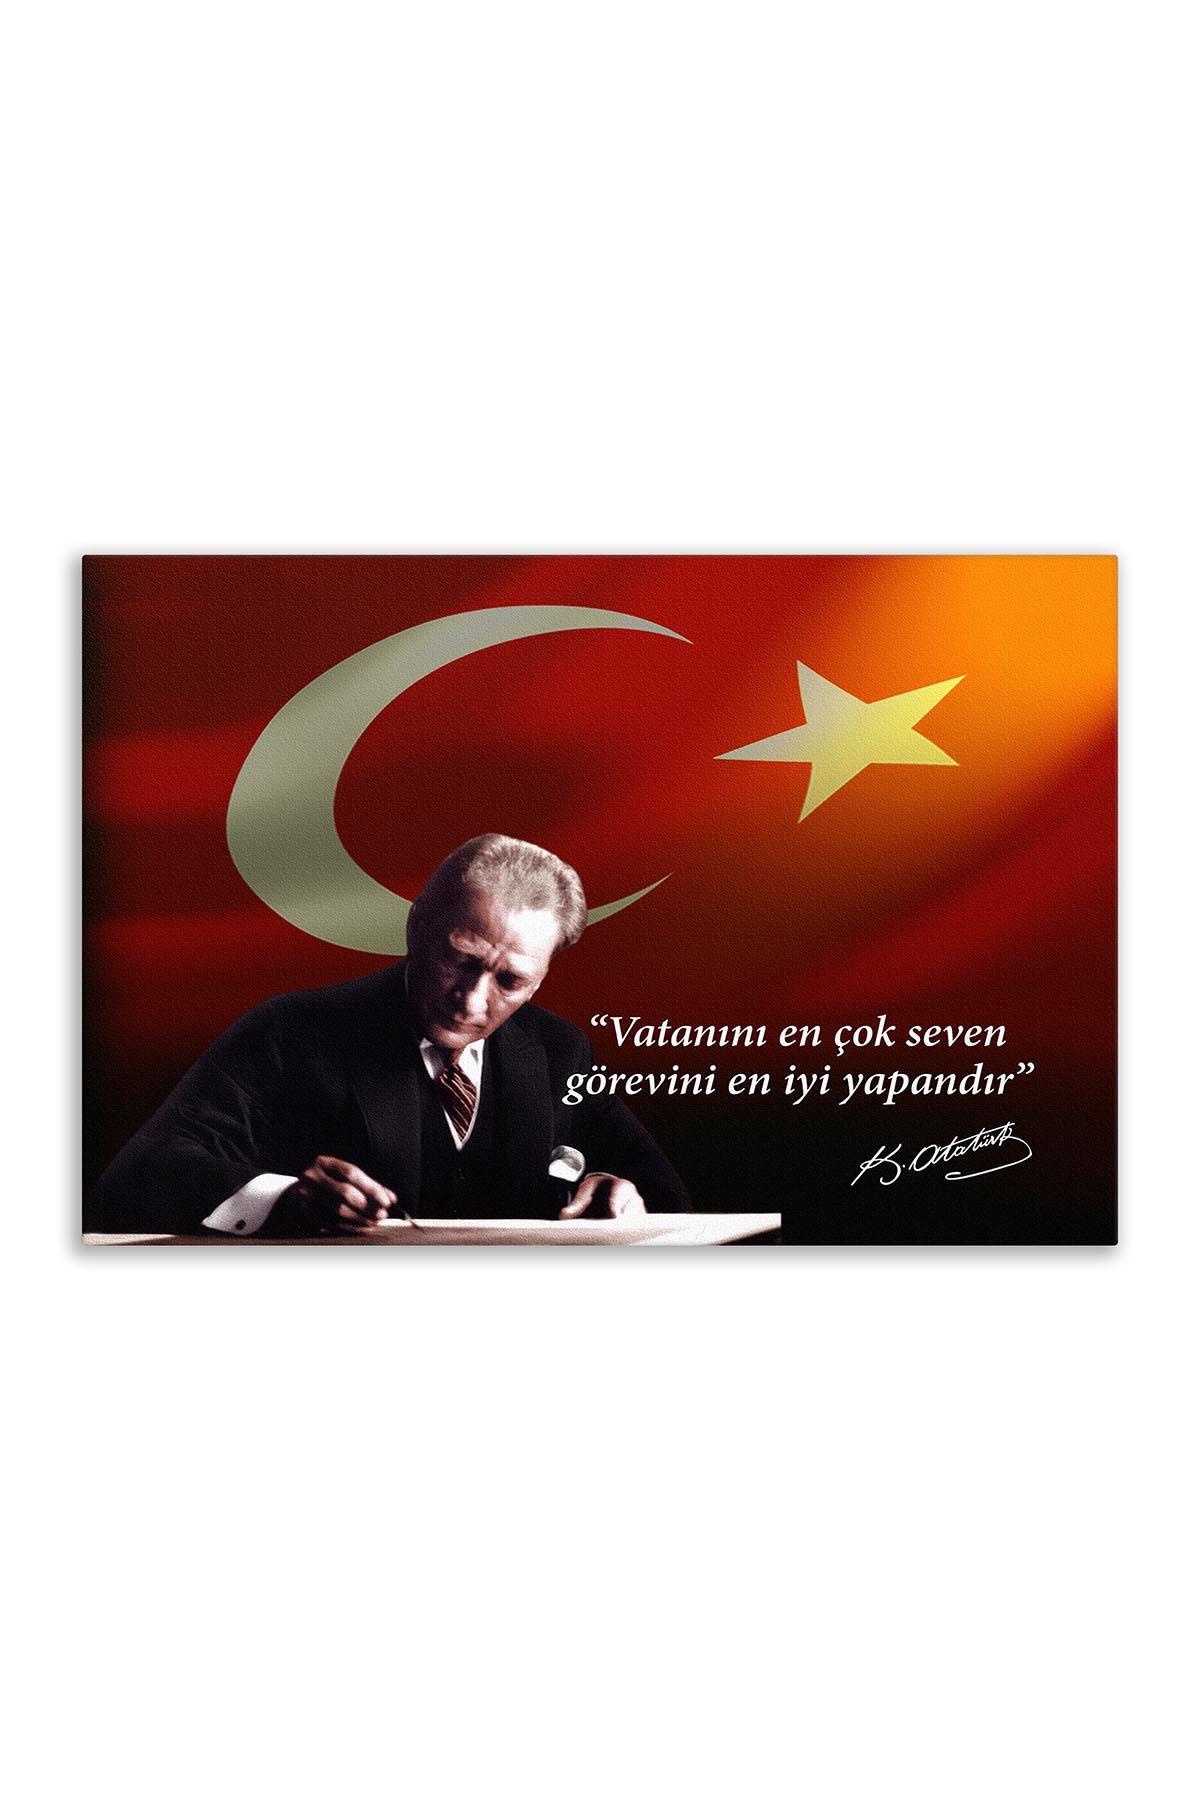 Atatürk In Council Canvas Board | Printed Canvas Board | Customized Board